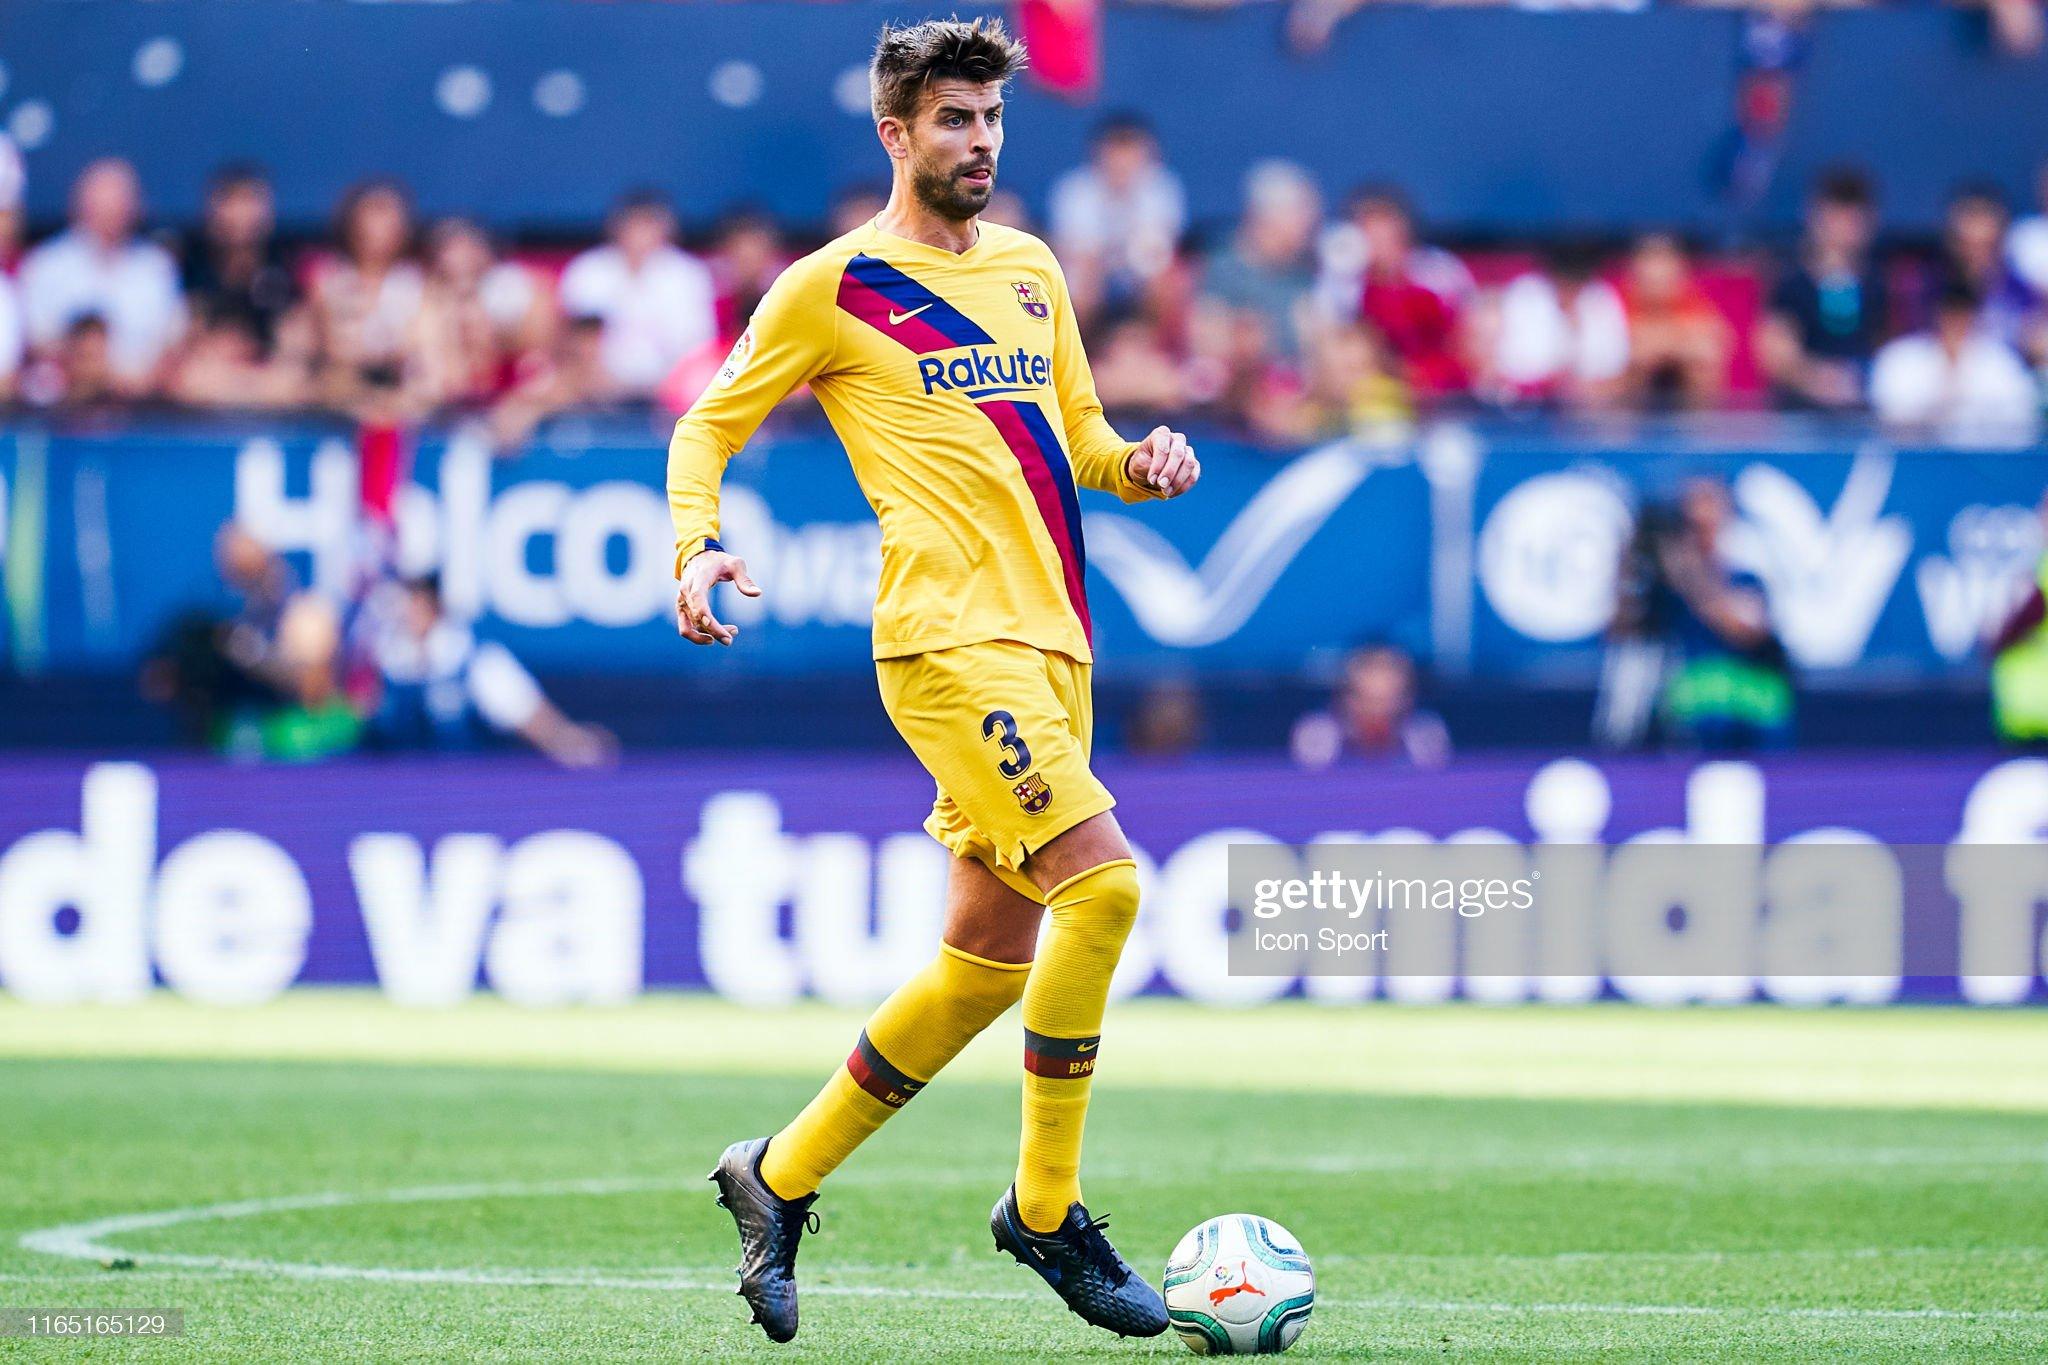 صور مباراة : أوساسونا - برشلونة 2-2 ( 31-08-2019 )  Gerard-pique-of-fc-barcelona-during-the-liga-match-between-osasuna-picture-id1165165129?s=2048x2048